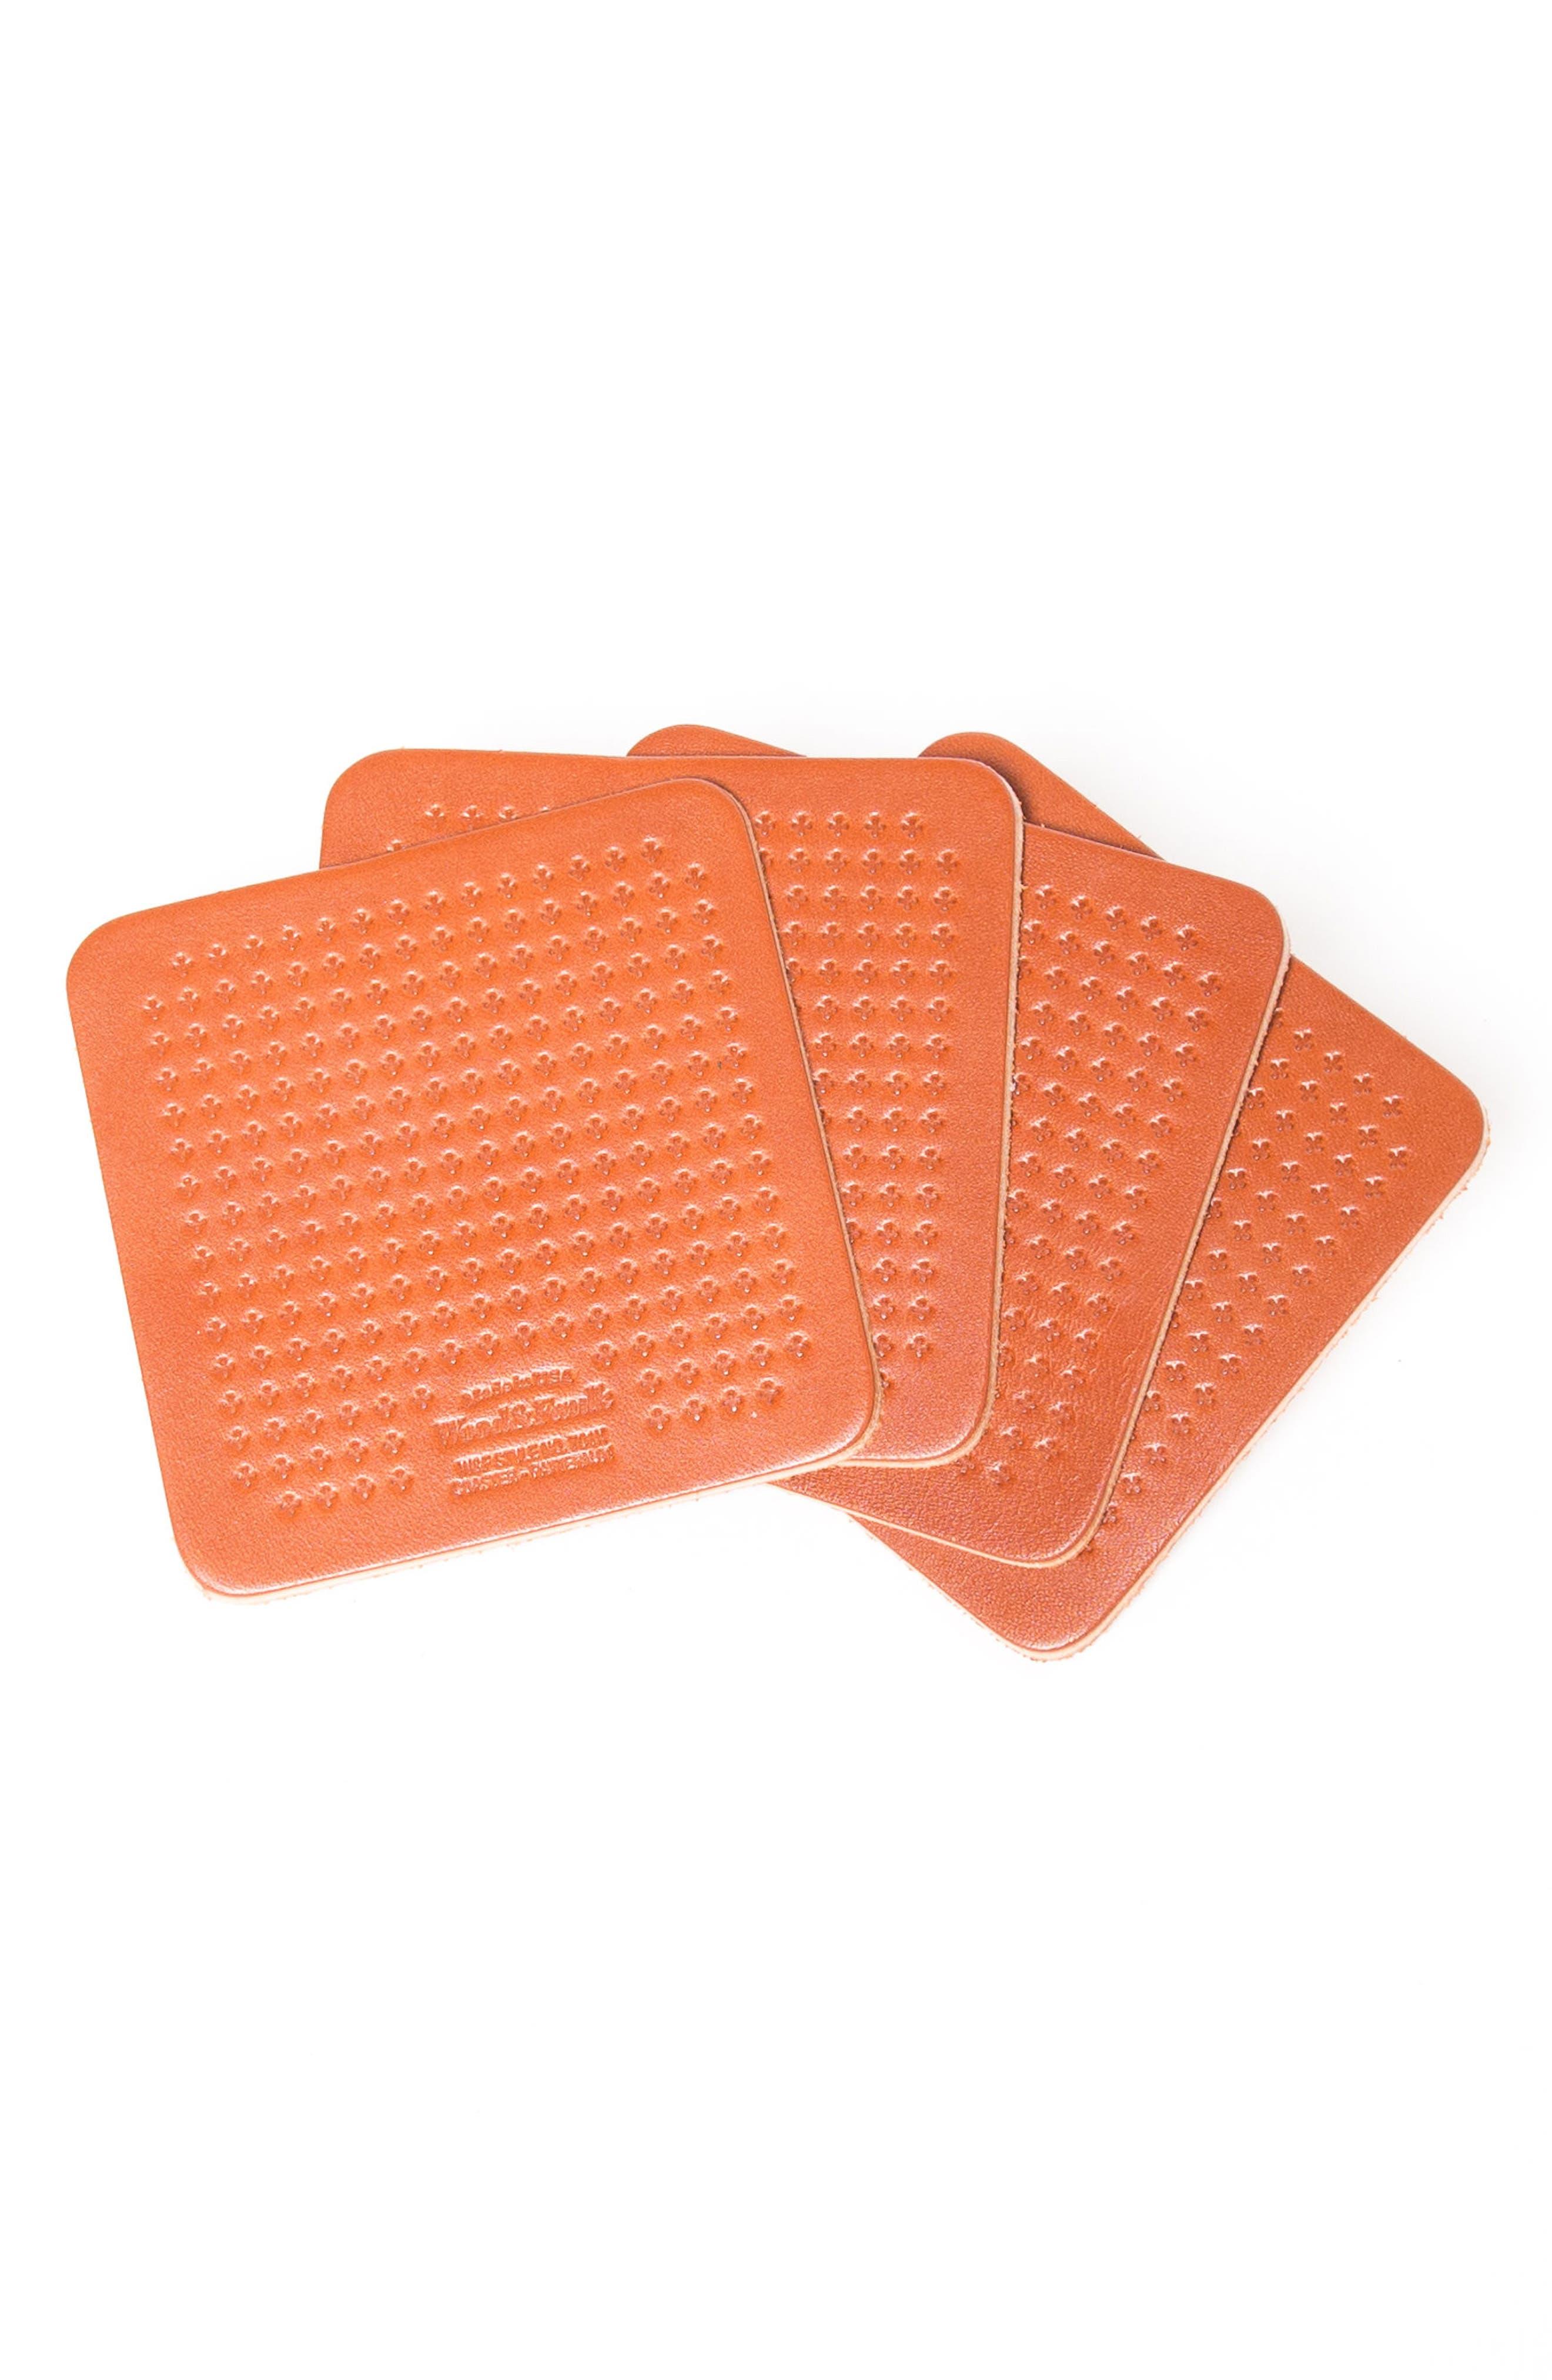 Alternate Image 1 Selected - Wood&Faulk Cross Pattern Leather Coaster Set